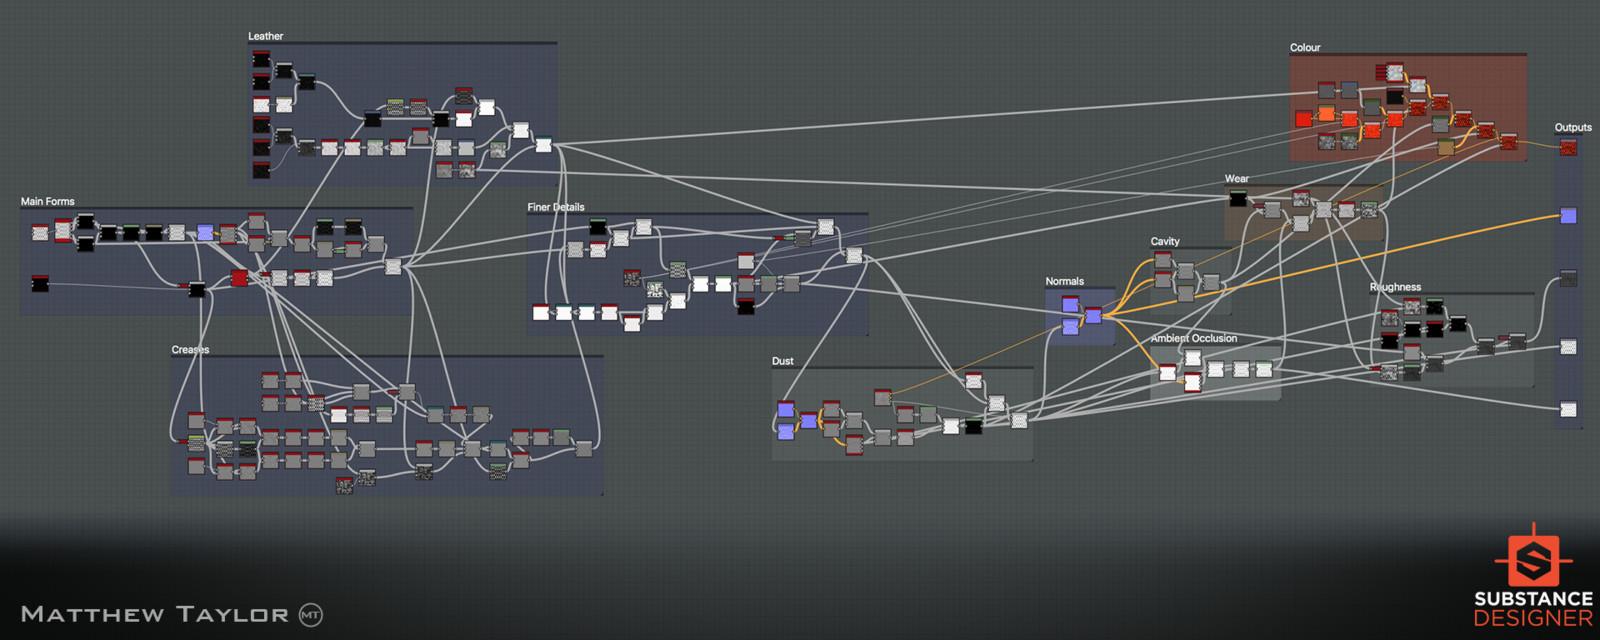 Substance graph.